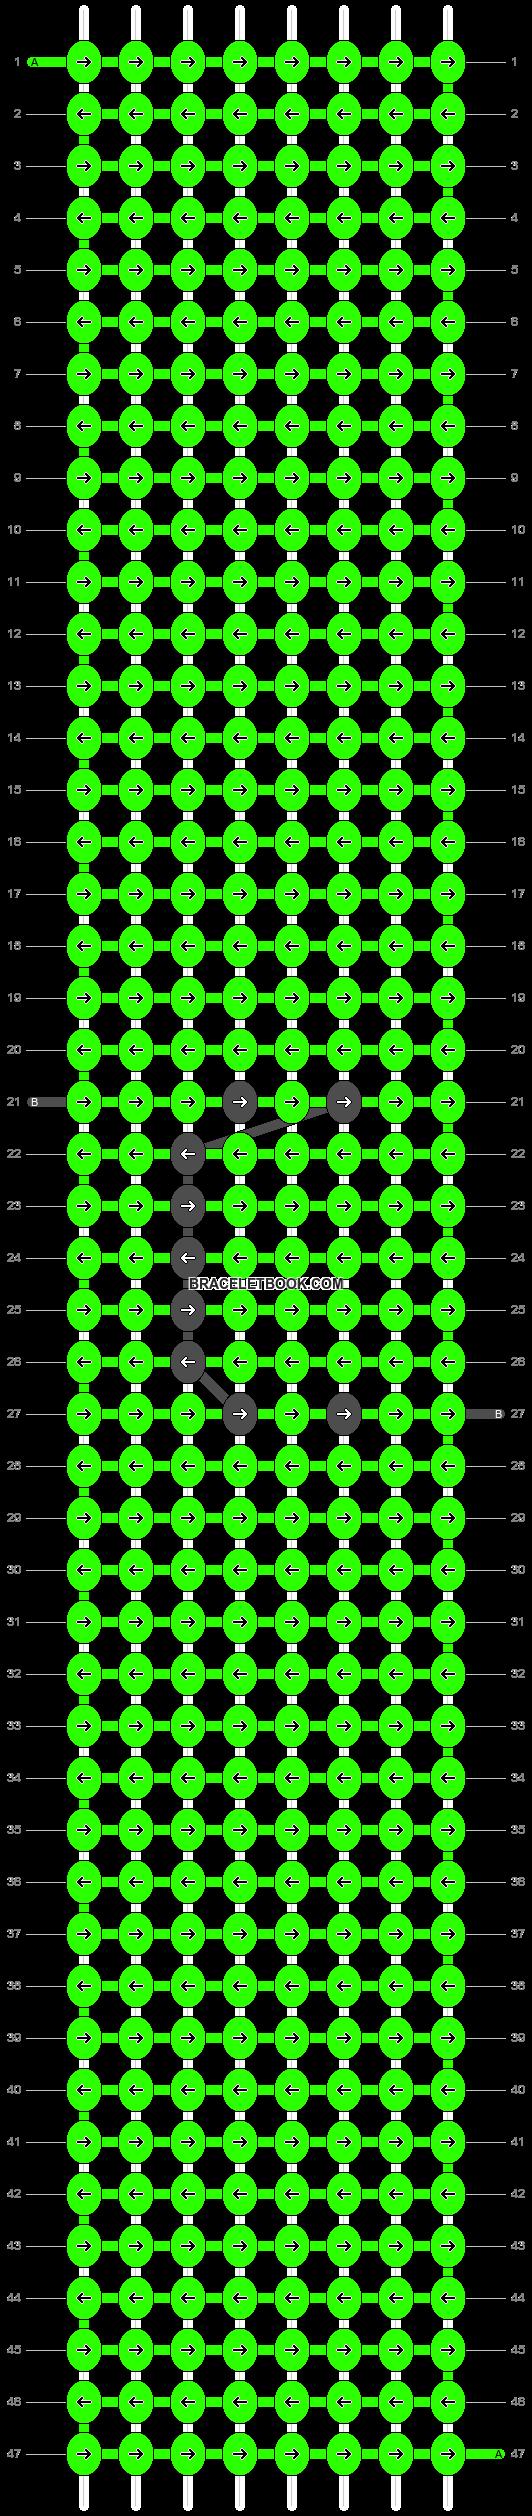 Alpha pattern #75957 pattern